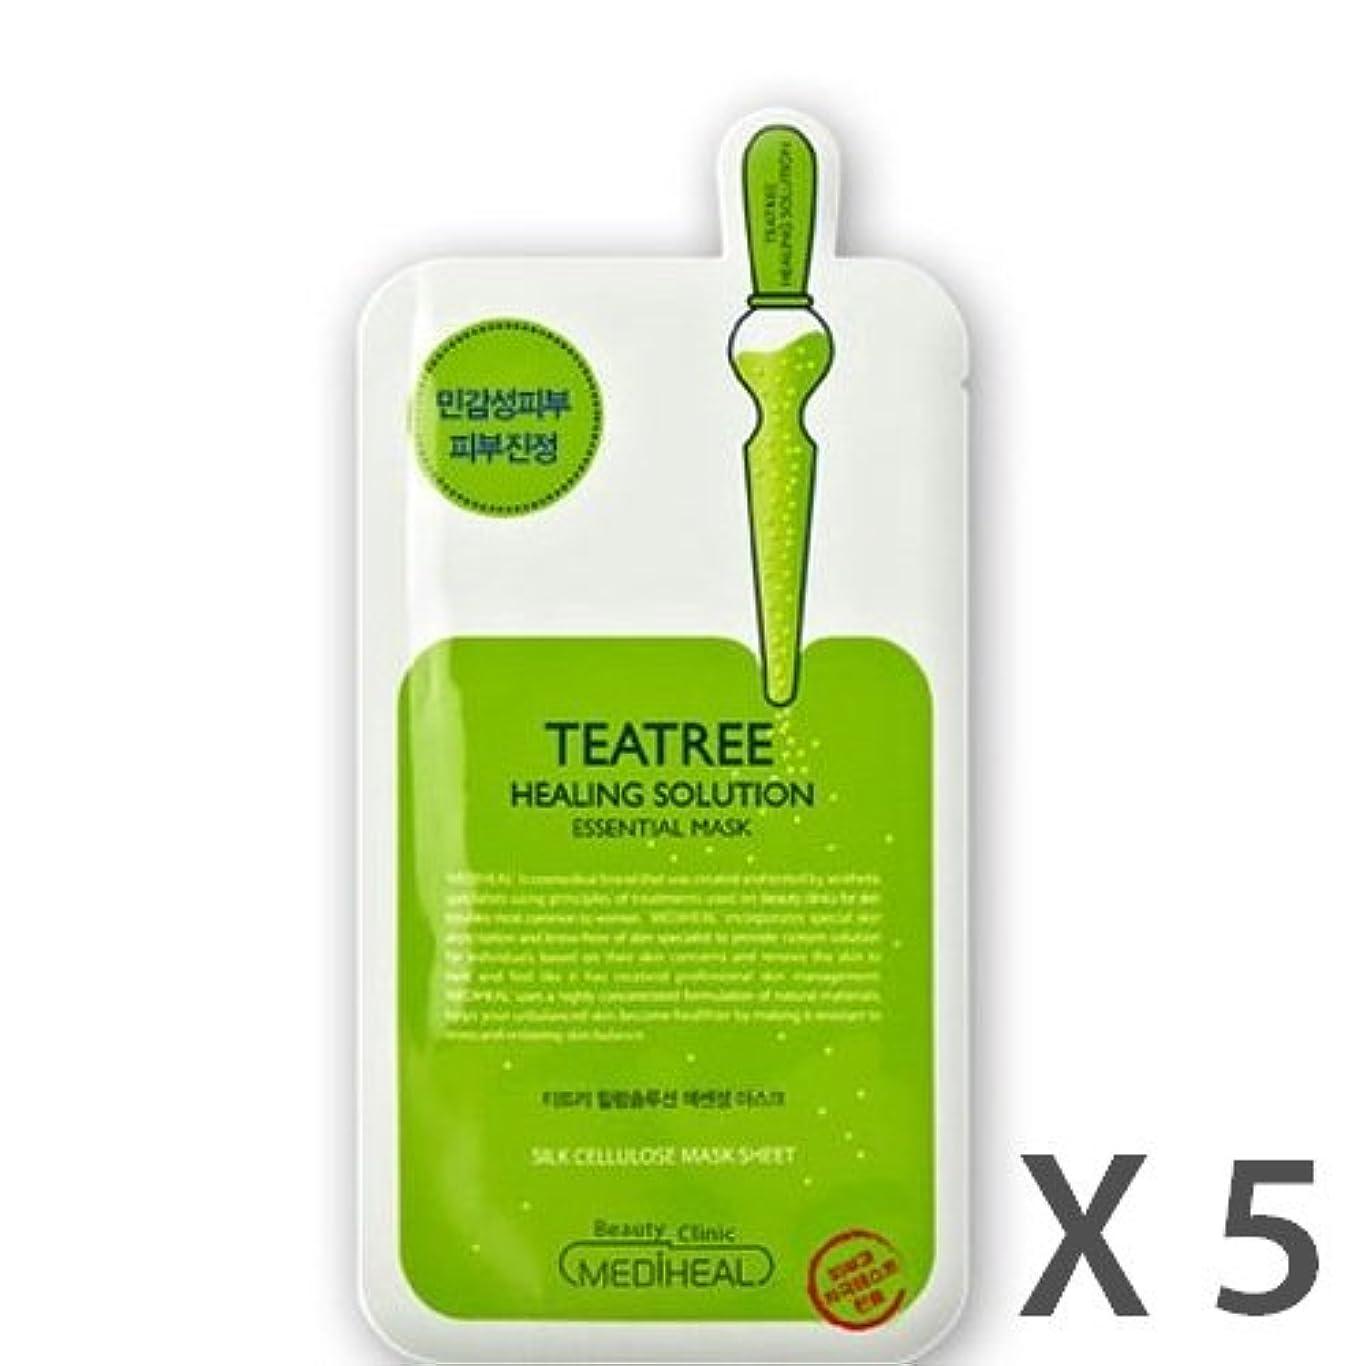 MEDIHEAL Tea Tree Healing Solution Essential Mask 5ea /メディヒール ティー ツリー ヒーリングソリューションエッセンシャルマスク 5ea [並行輸入品]